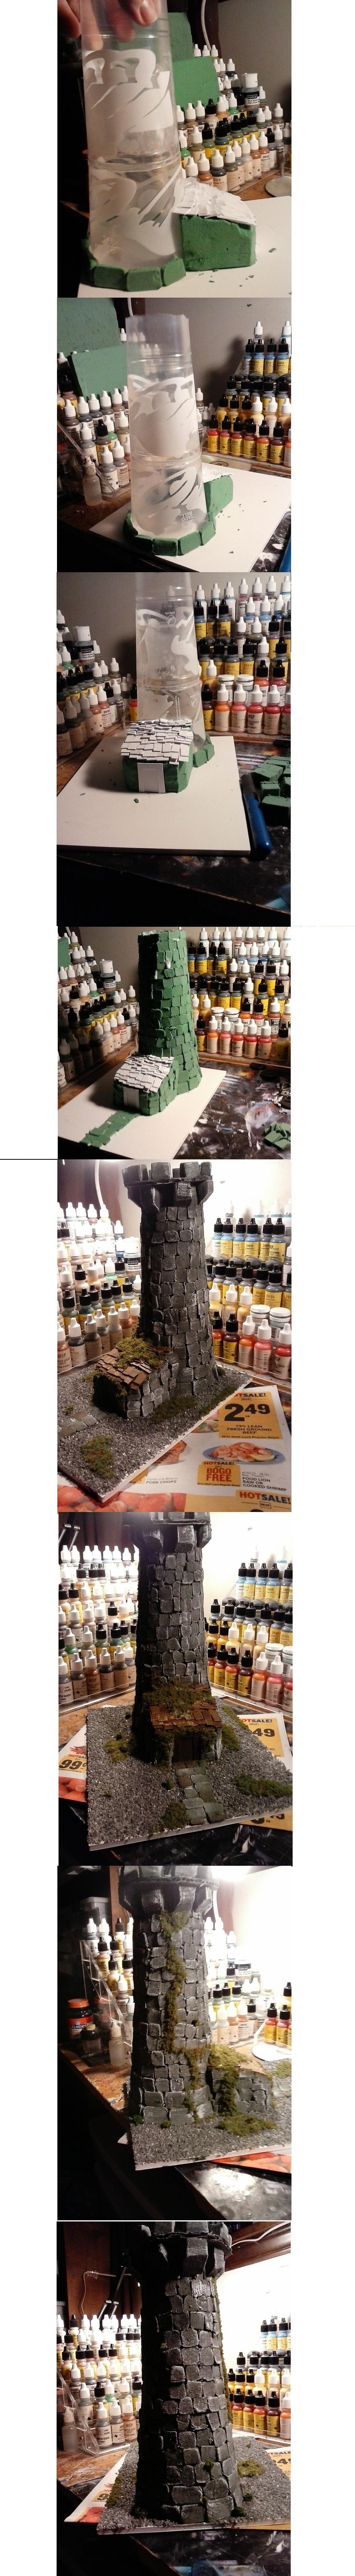 Built, Moss, Scratch, Tower, Weathered